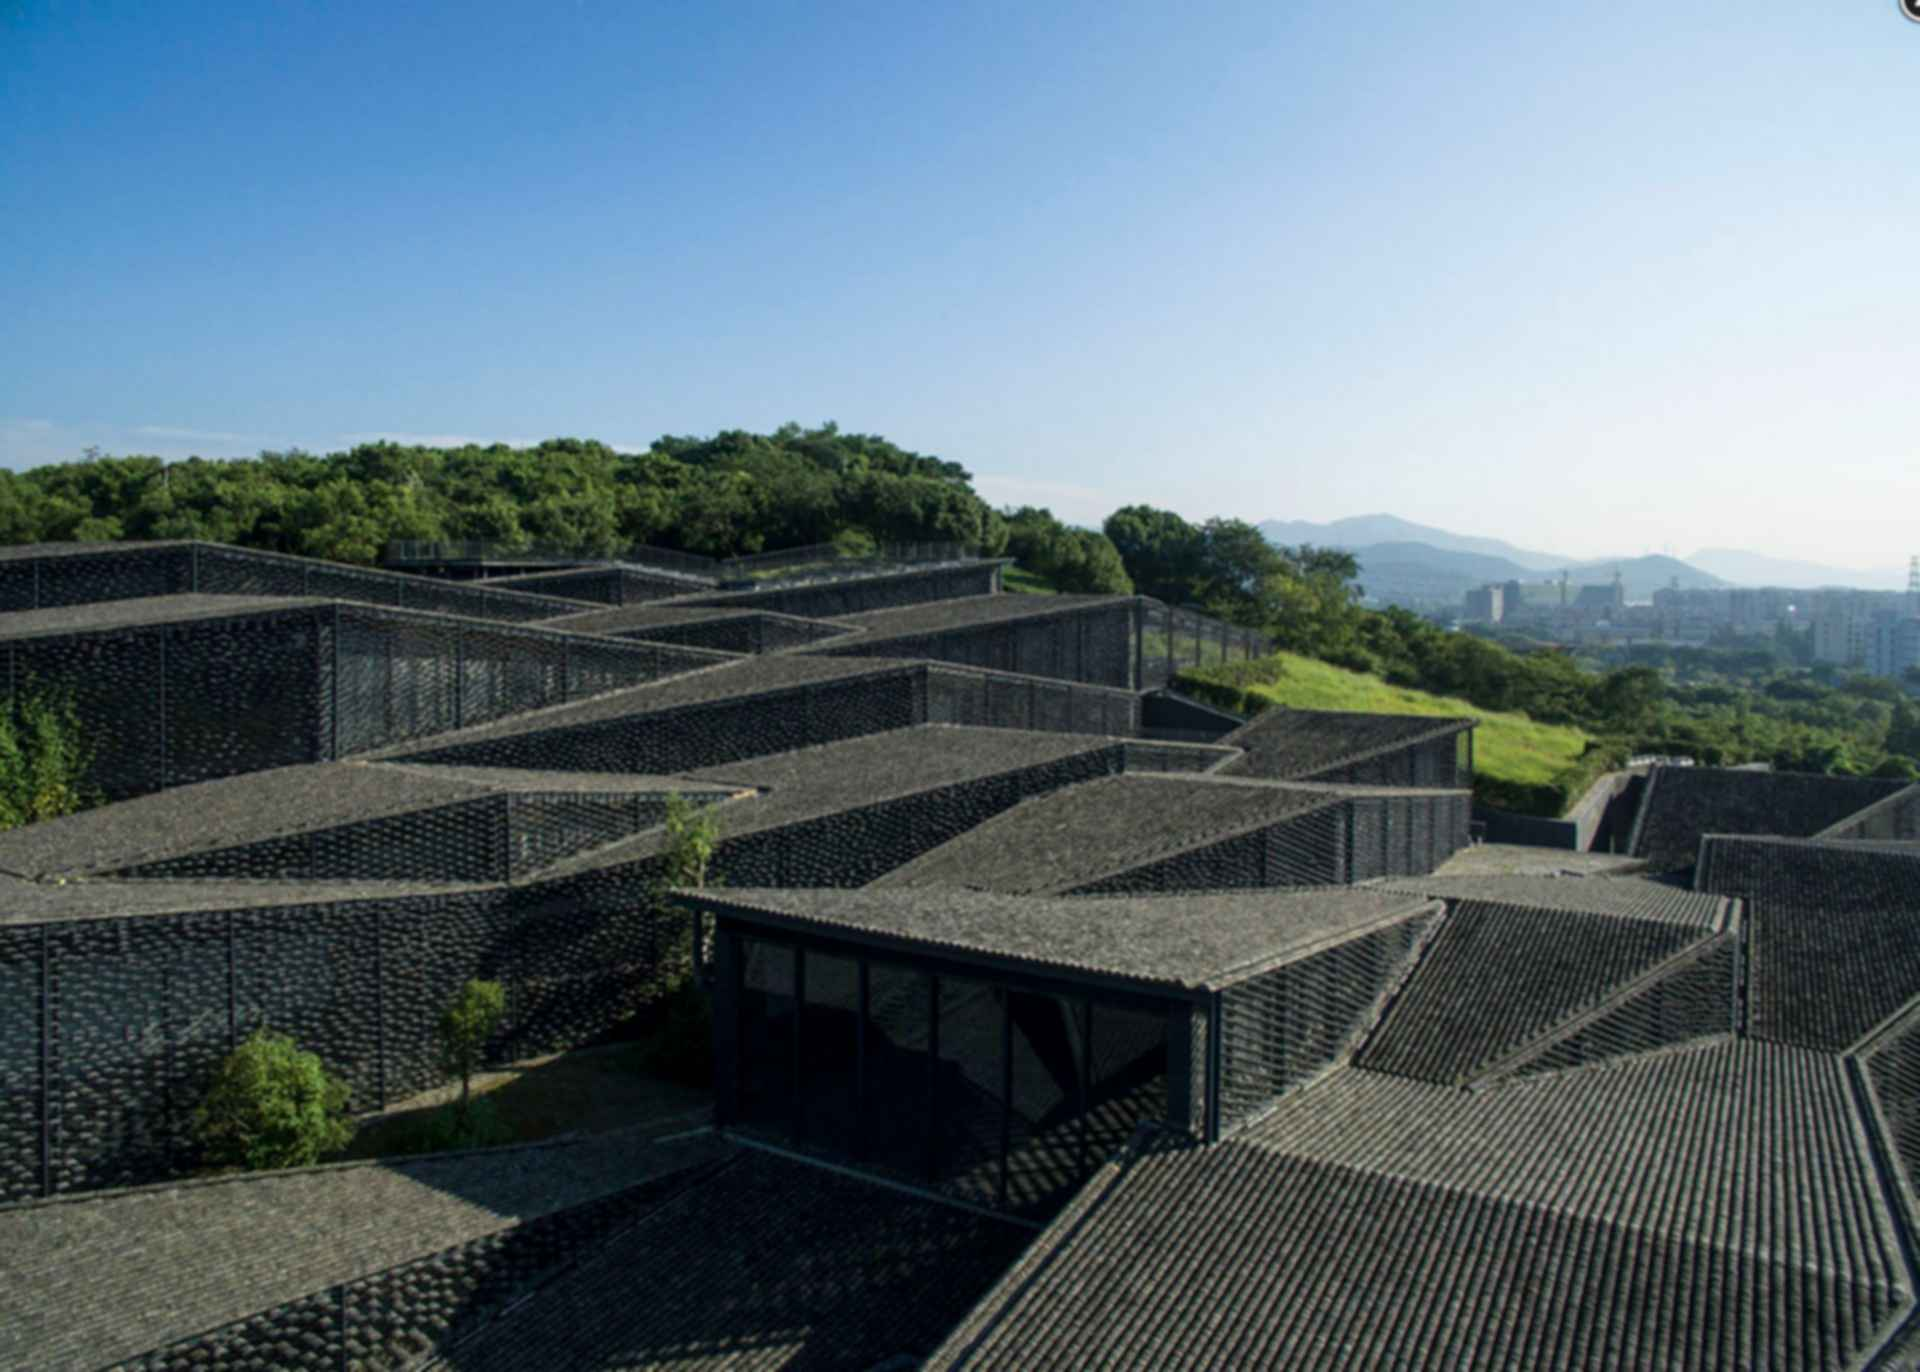 China Academy of Art's Folk Art Museum - Exterior/Landscape